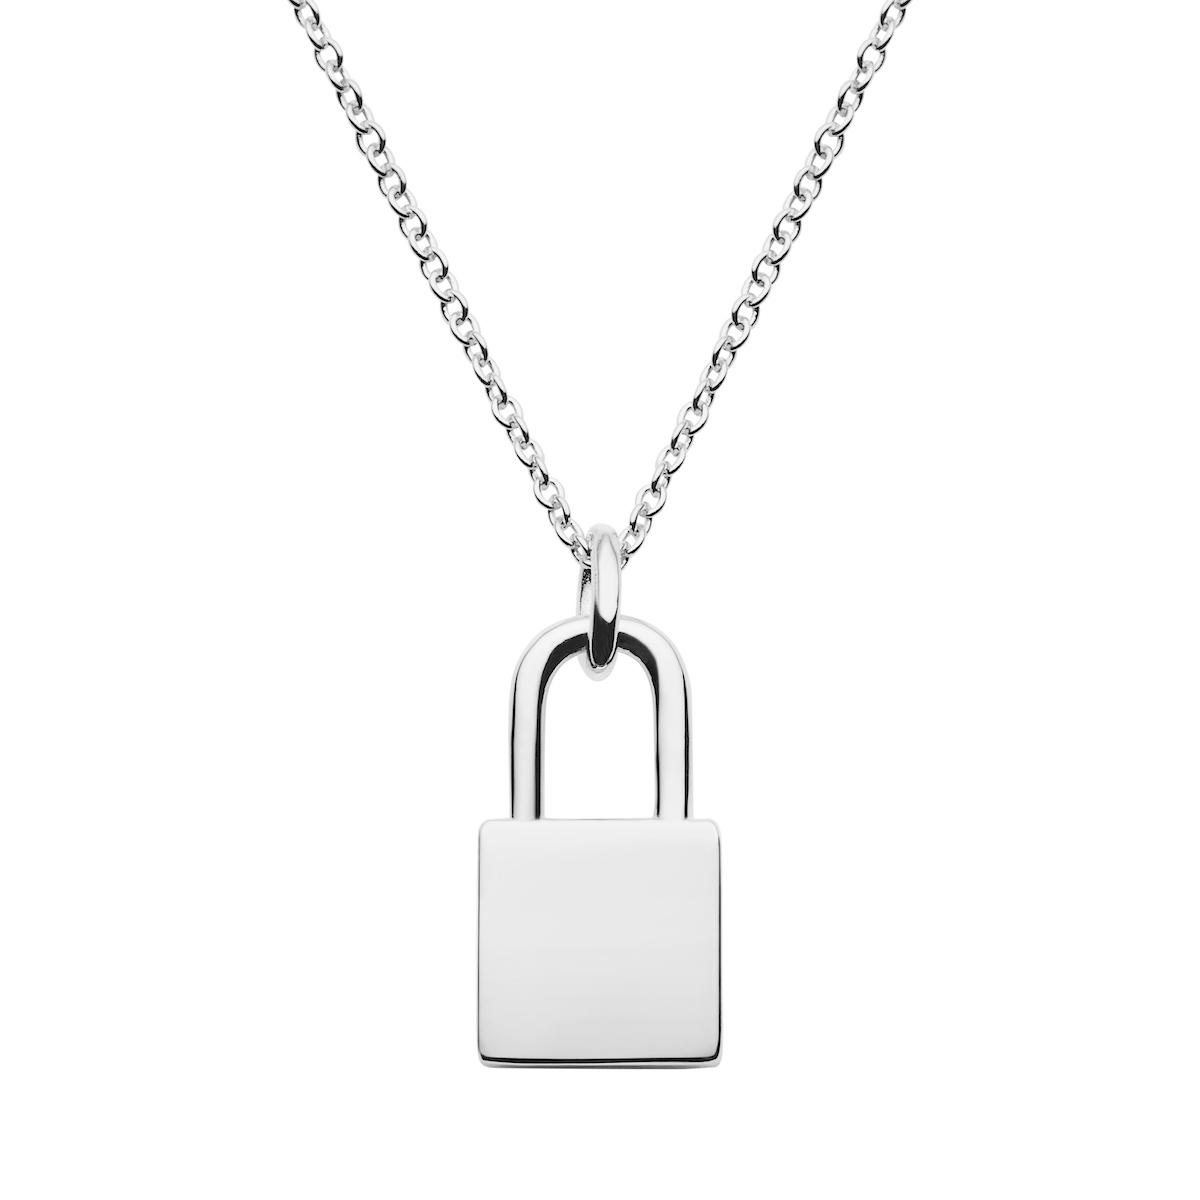 628b652474855 Silver Lock Necklace